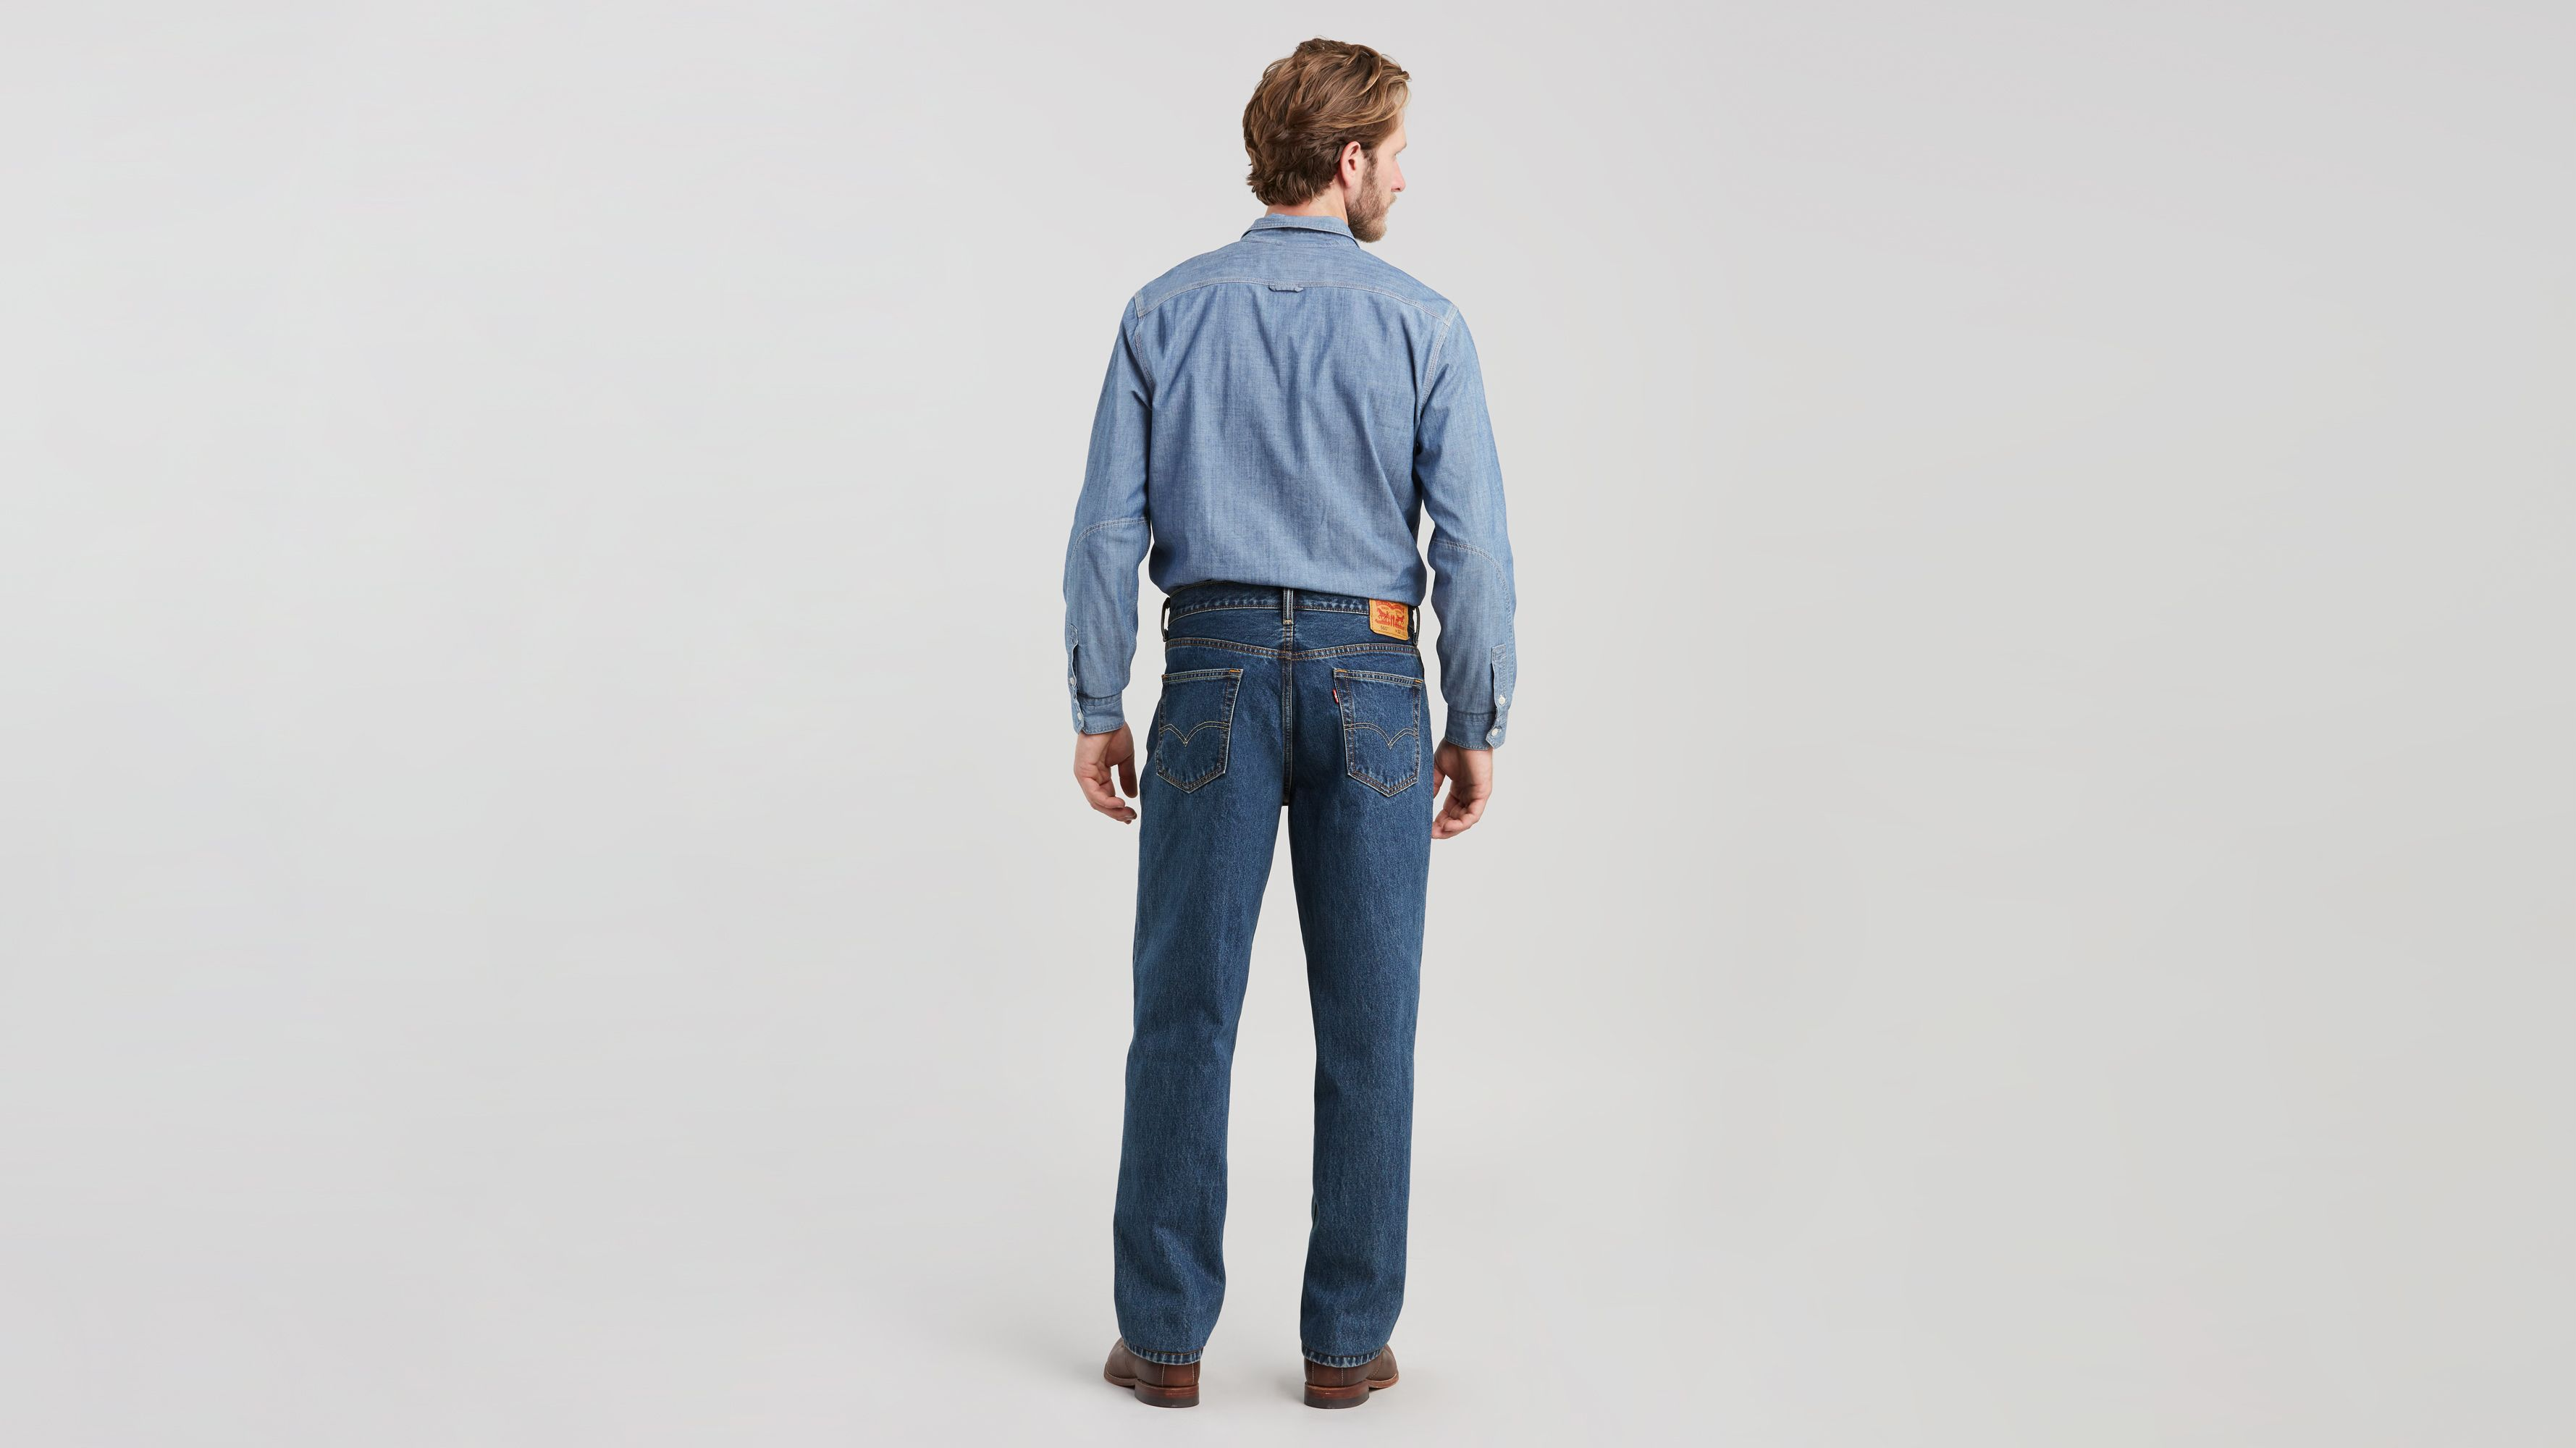 40790e30273 560™ Comfort Fit Jeans (big   Tall) - Medium Wash